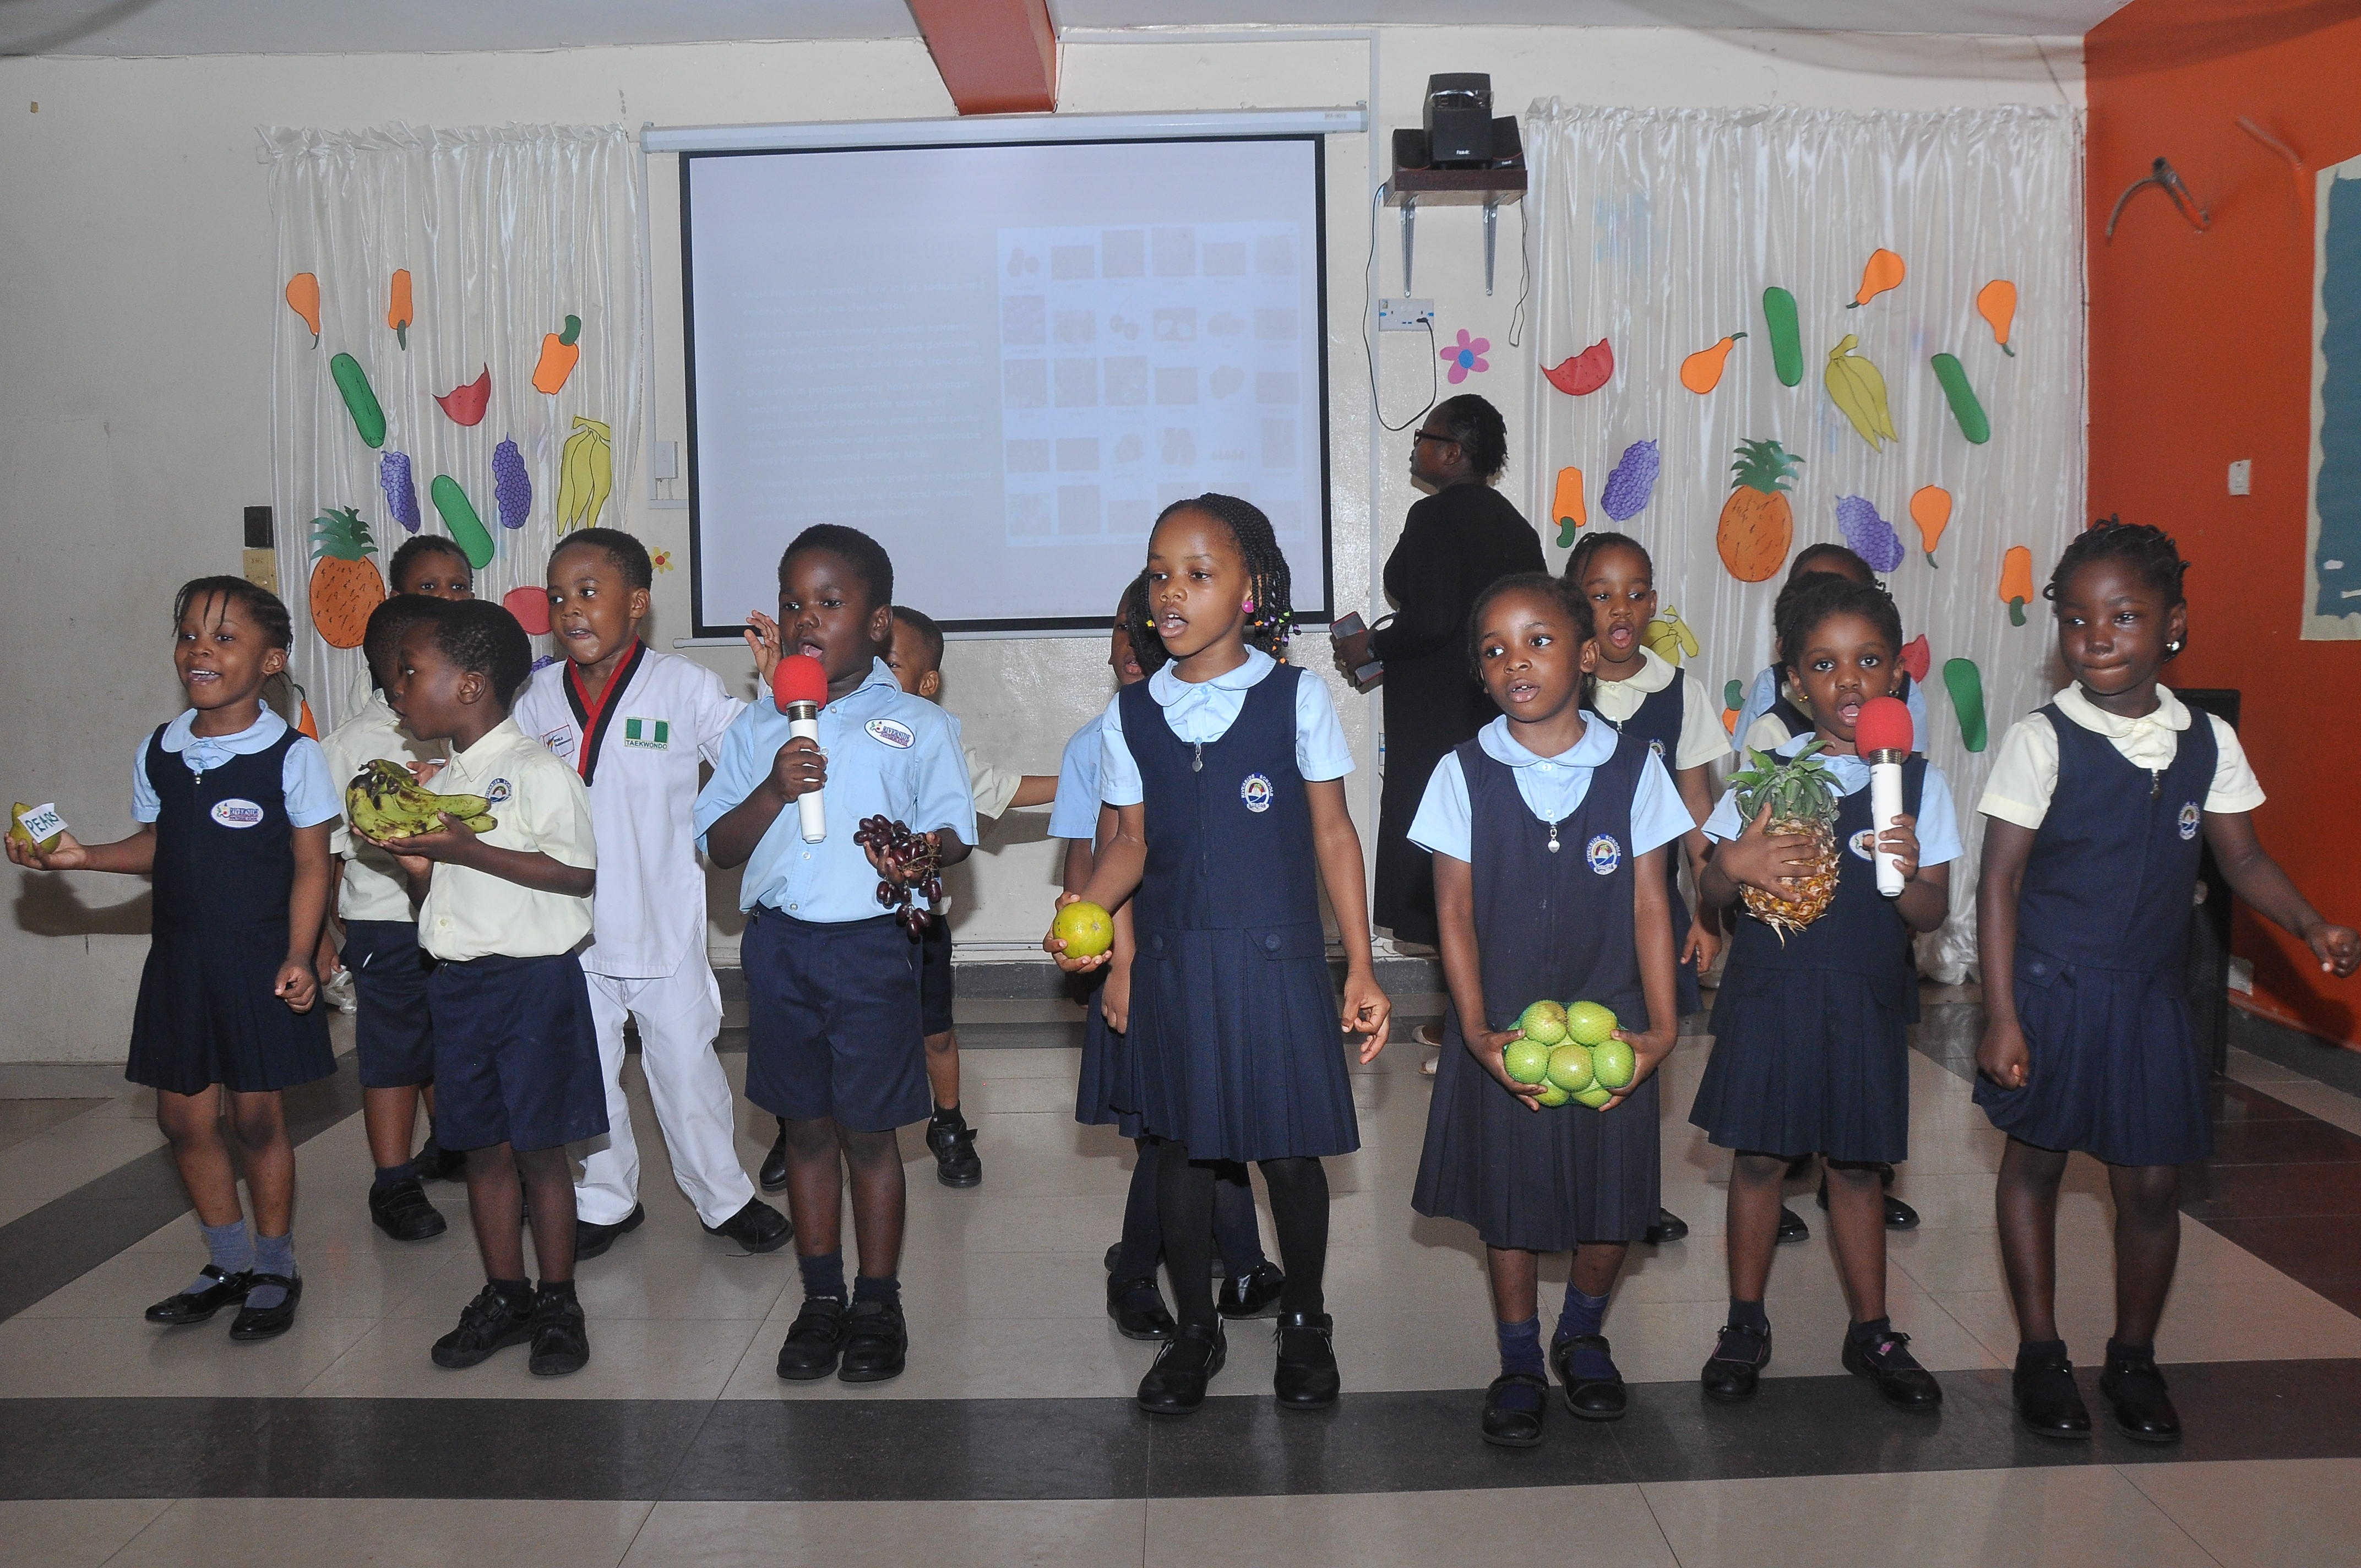 fruits_health_nursery_school_theme_presentations_riverside_montessori (4)